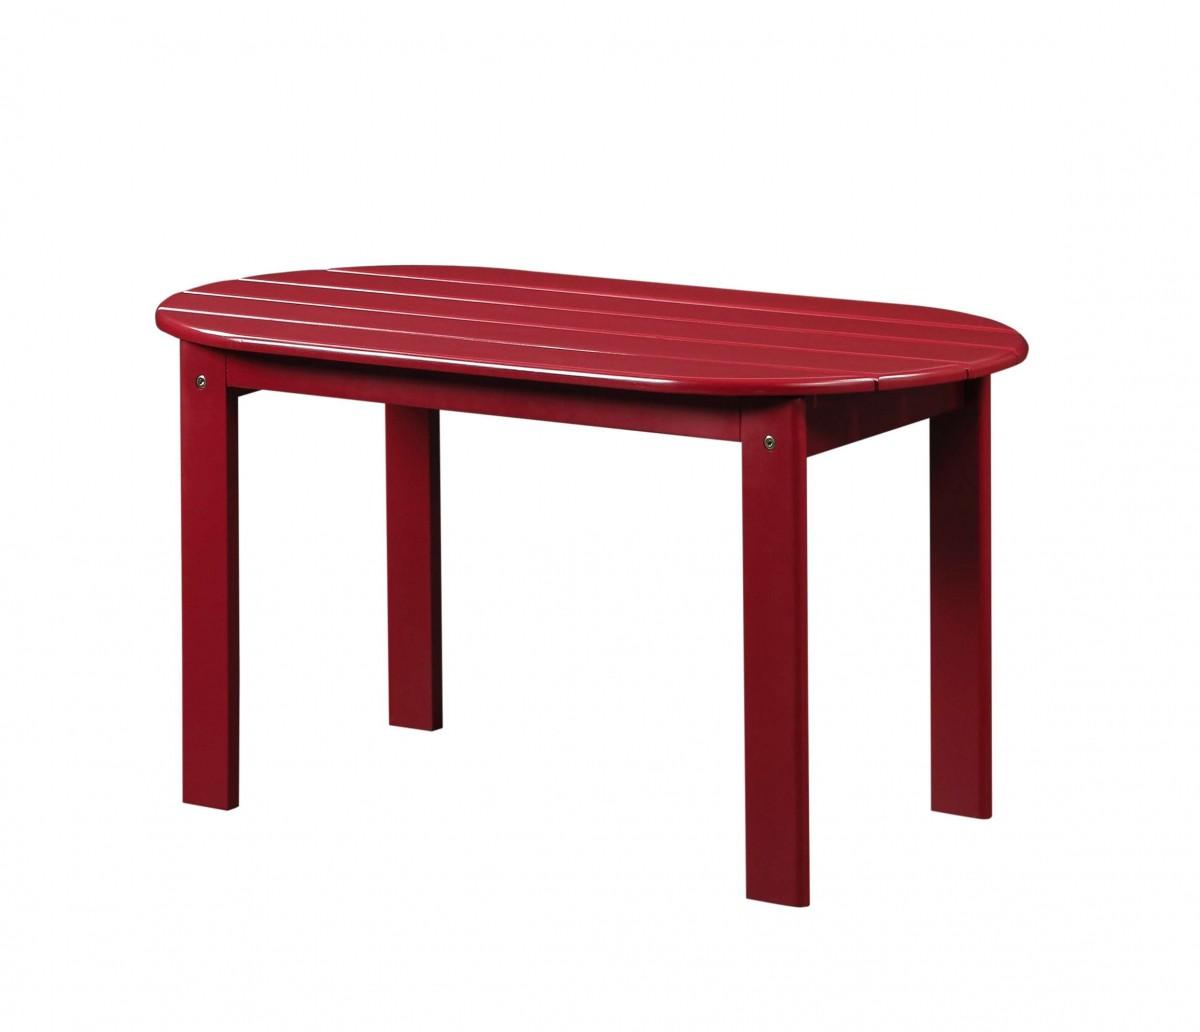 Home Decor Inc: Linon Home Decor Products Inc. Red Adirondack Coffee Table